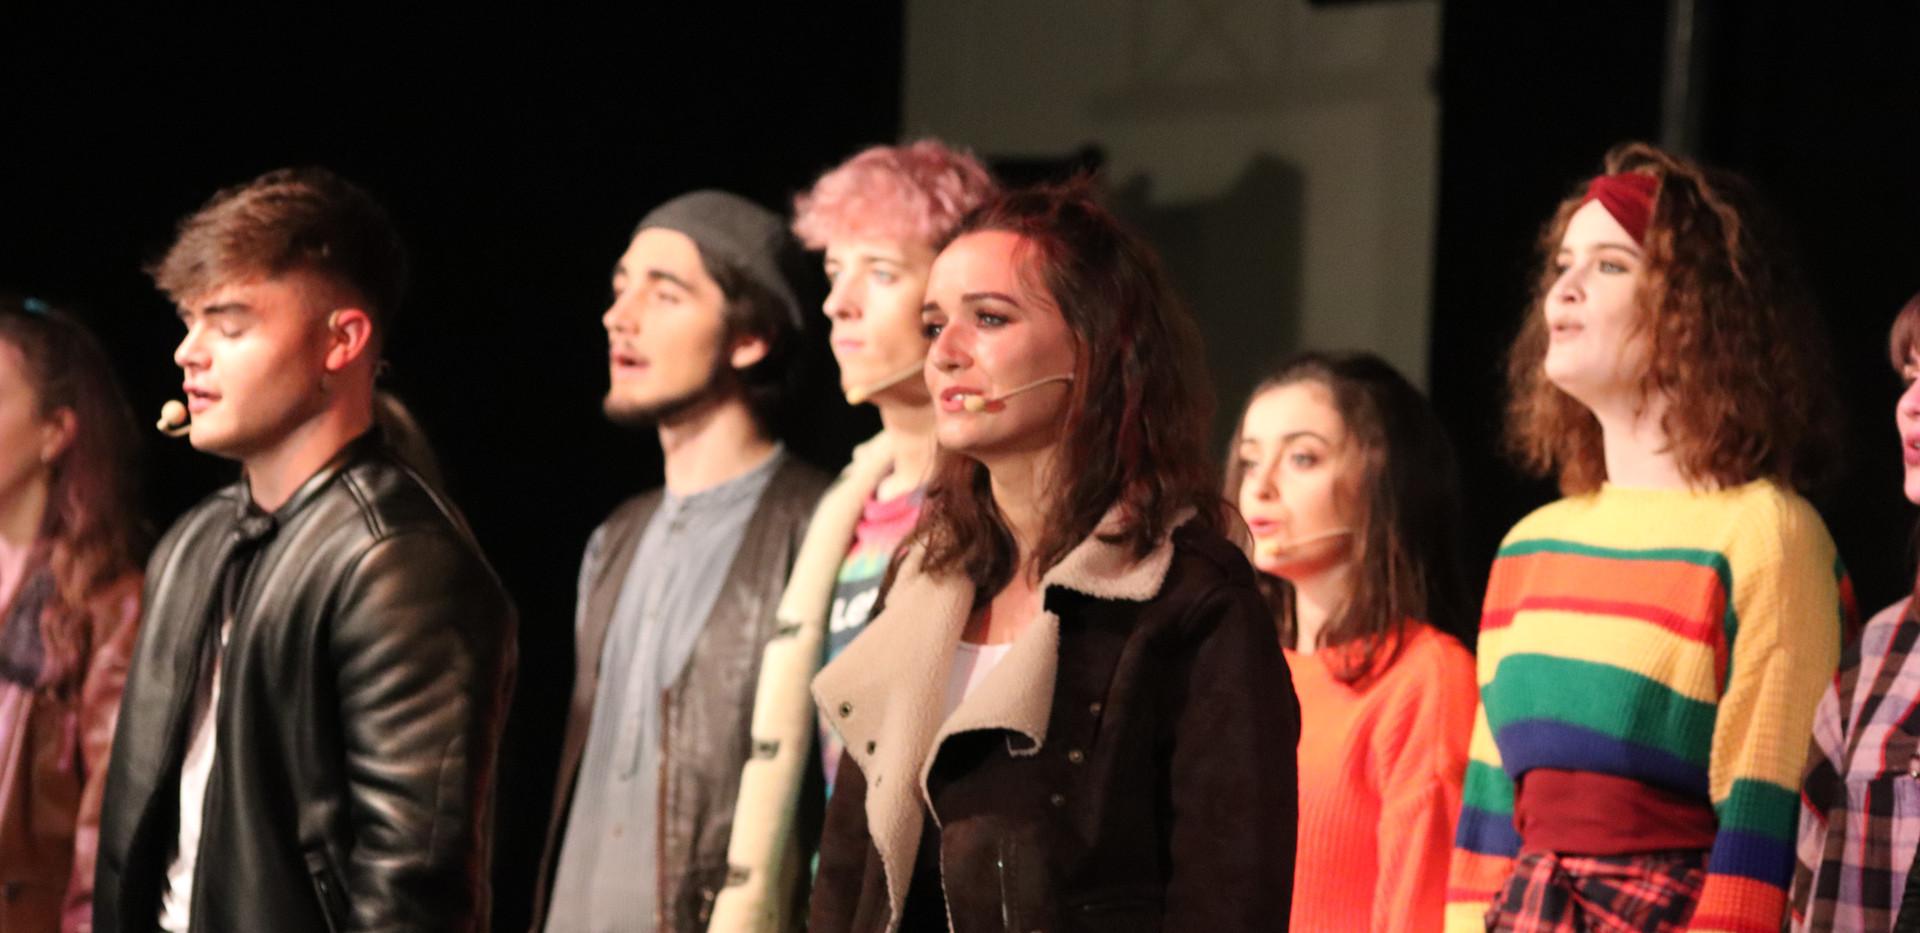 Halls Musical 2018 - RENT